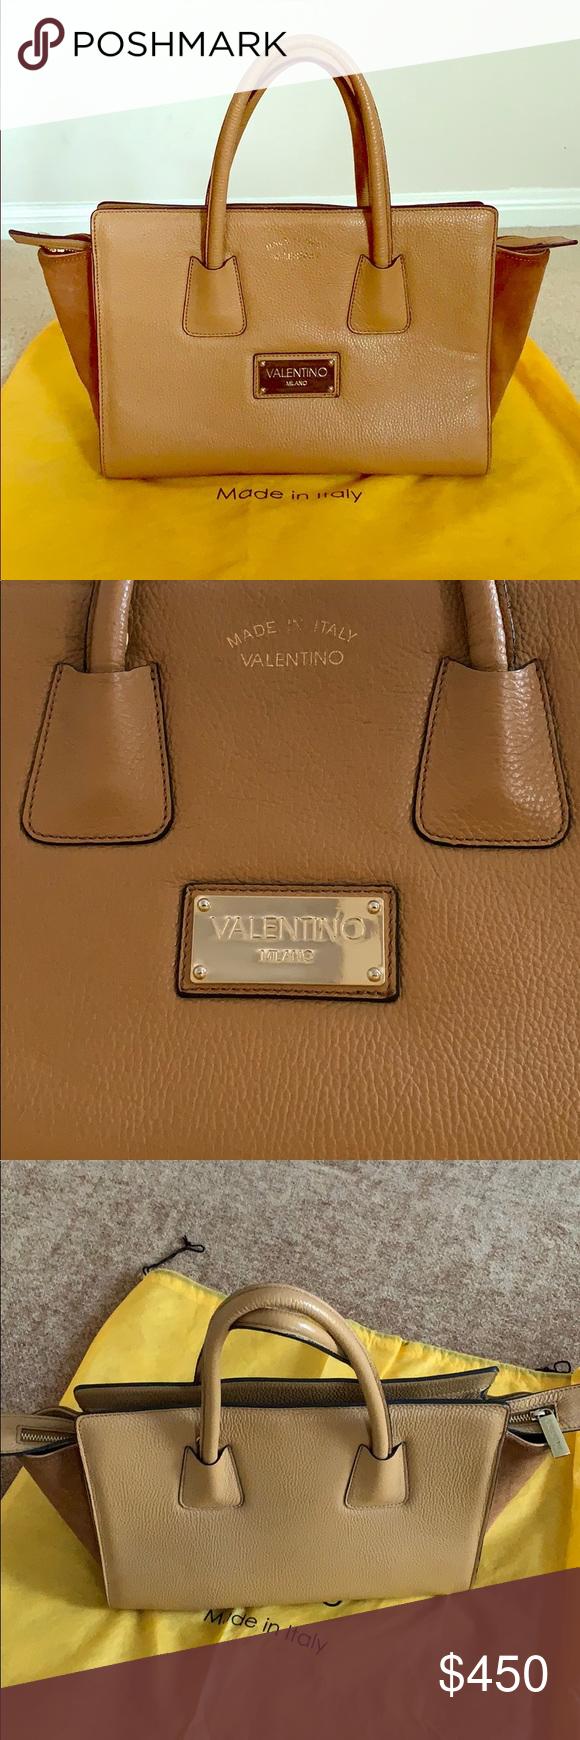 ed1601926b78 VALENTINO by Mario Valentino Kiria Authentic Looks like new Barely used  Color caramello Valentino Bags Totes